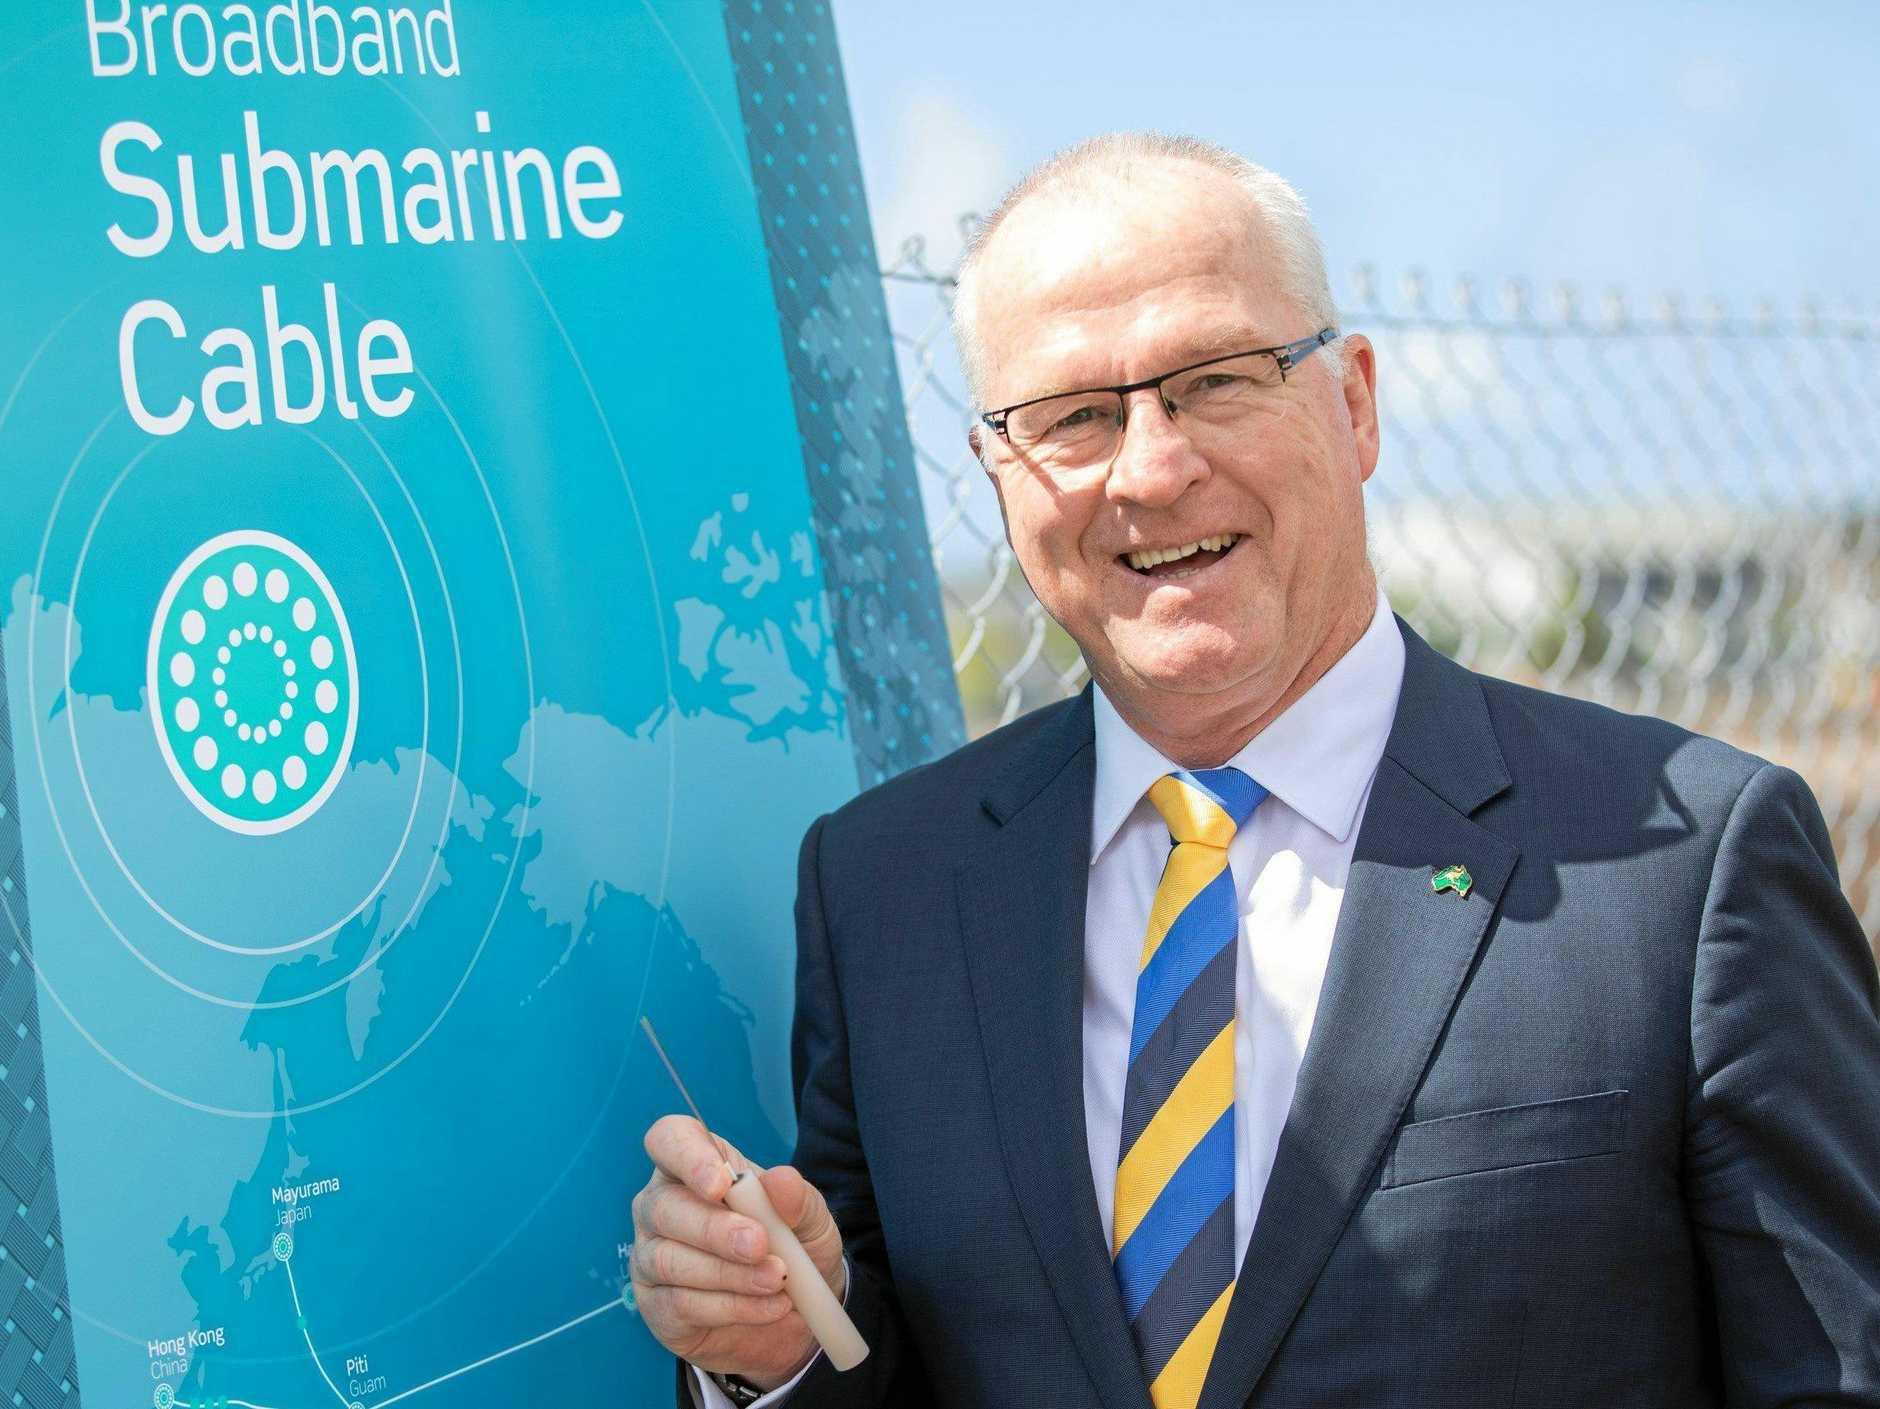 MILESTONE: The broadband submarine cable has marked a major milestone.